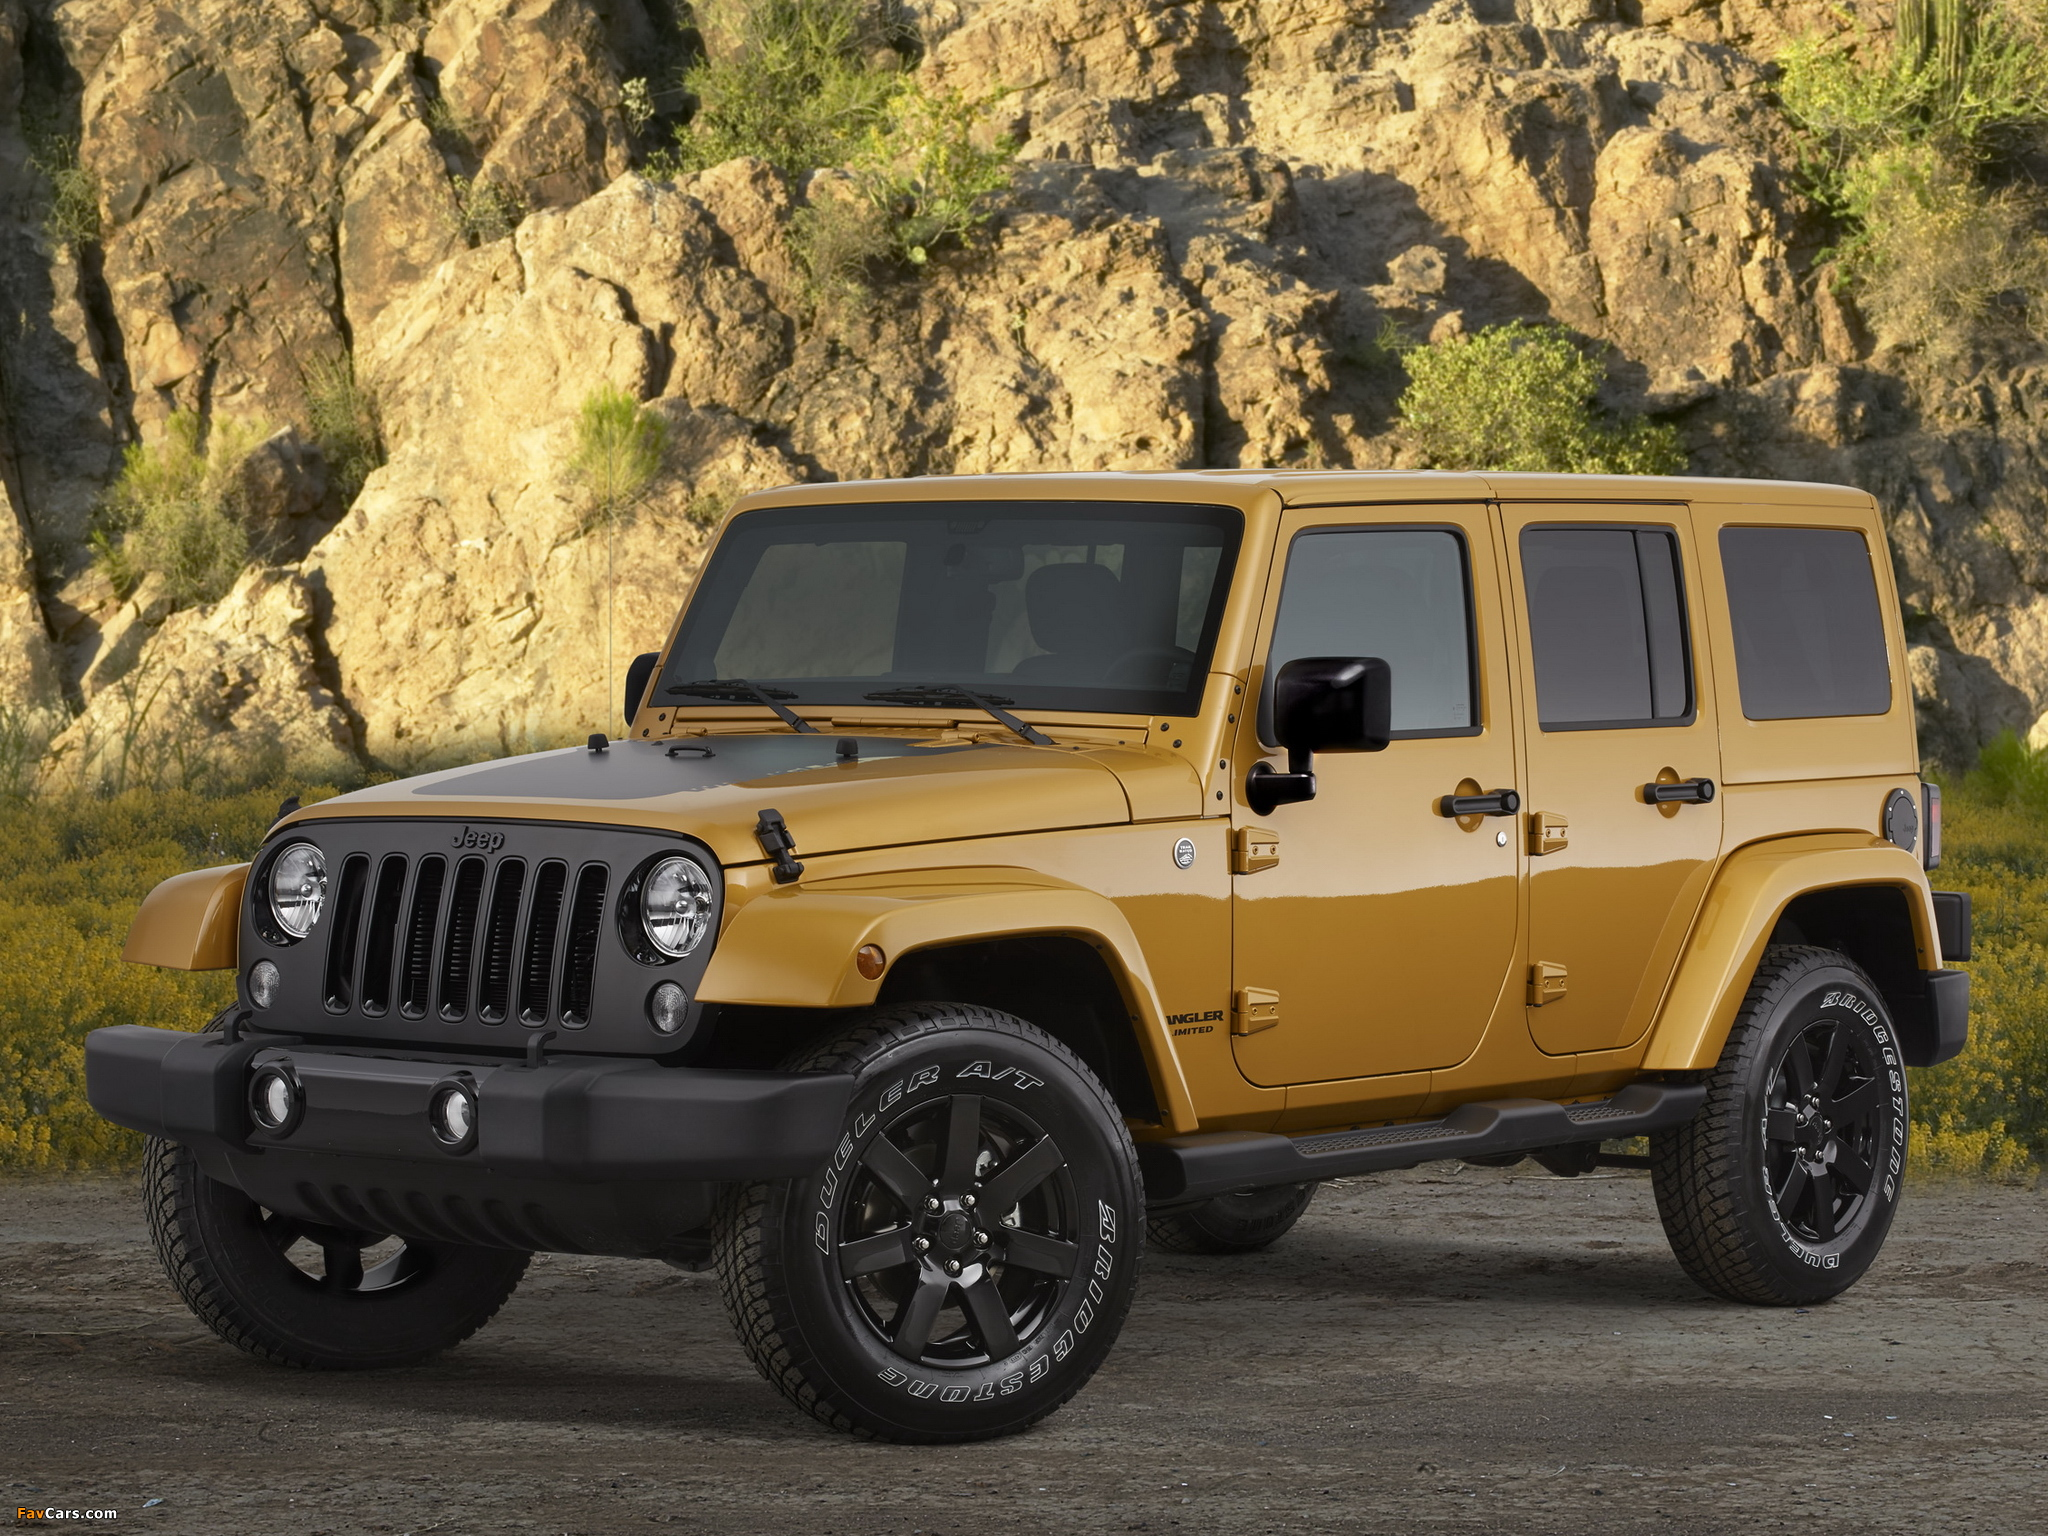 Jeep Wrangler Unlimited Altitude (JK) 2014 photos (2048 x 1536)